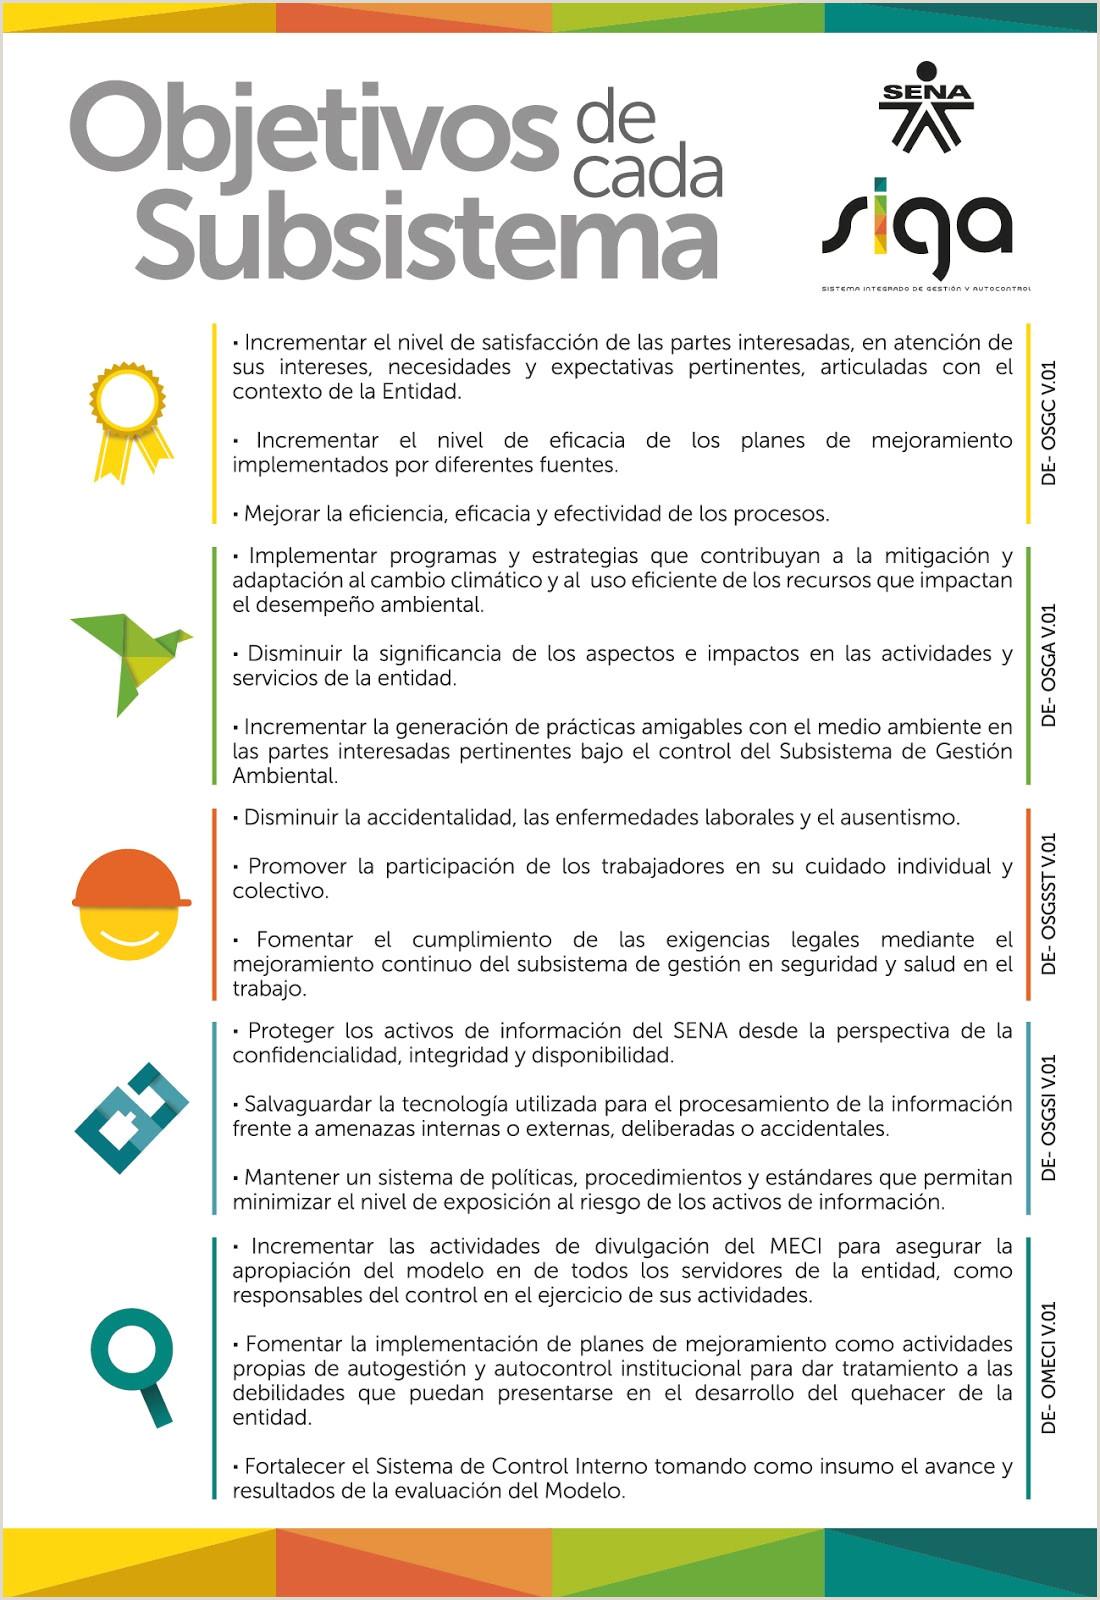 Formato Hoja De Vida Sena Plejo Tecnol³gico Agroindustrial Pecuario Y Turstico